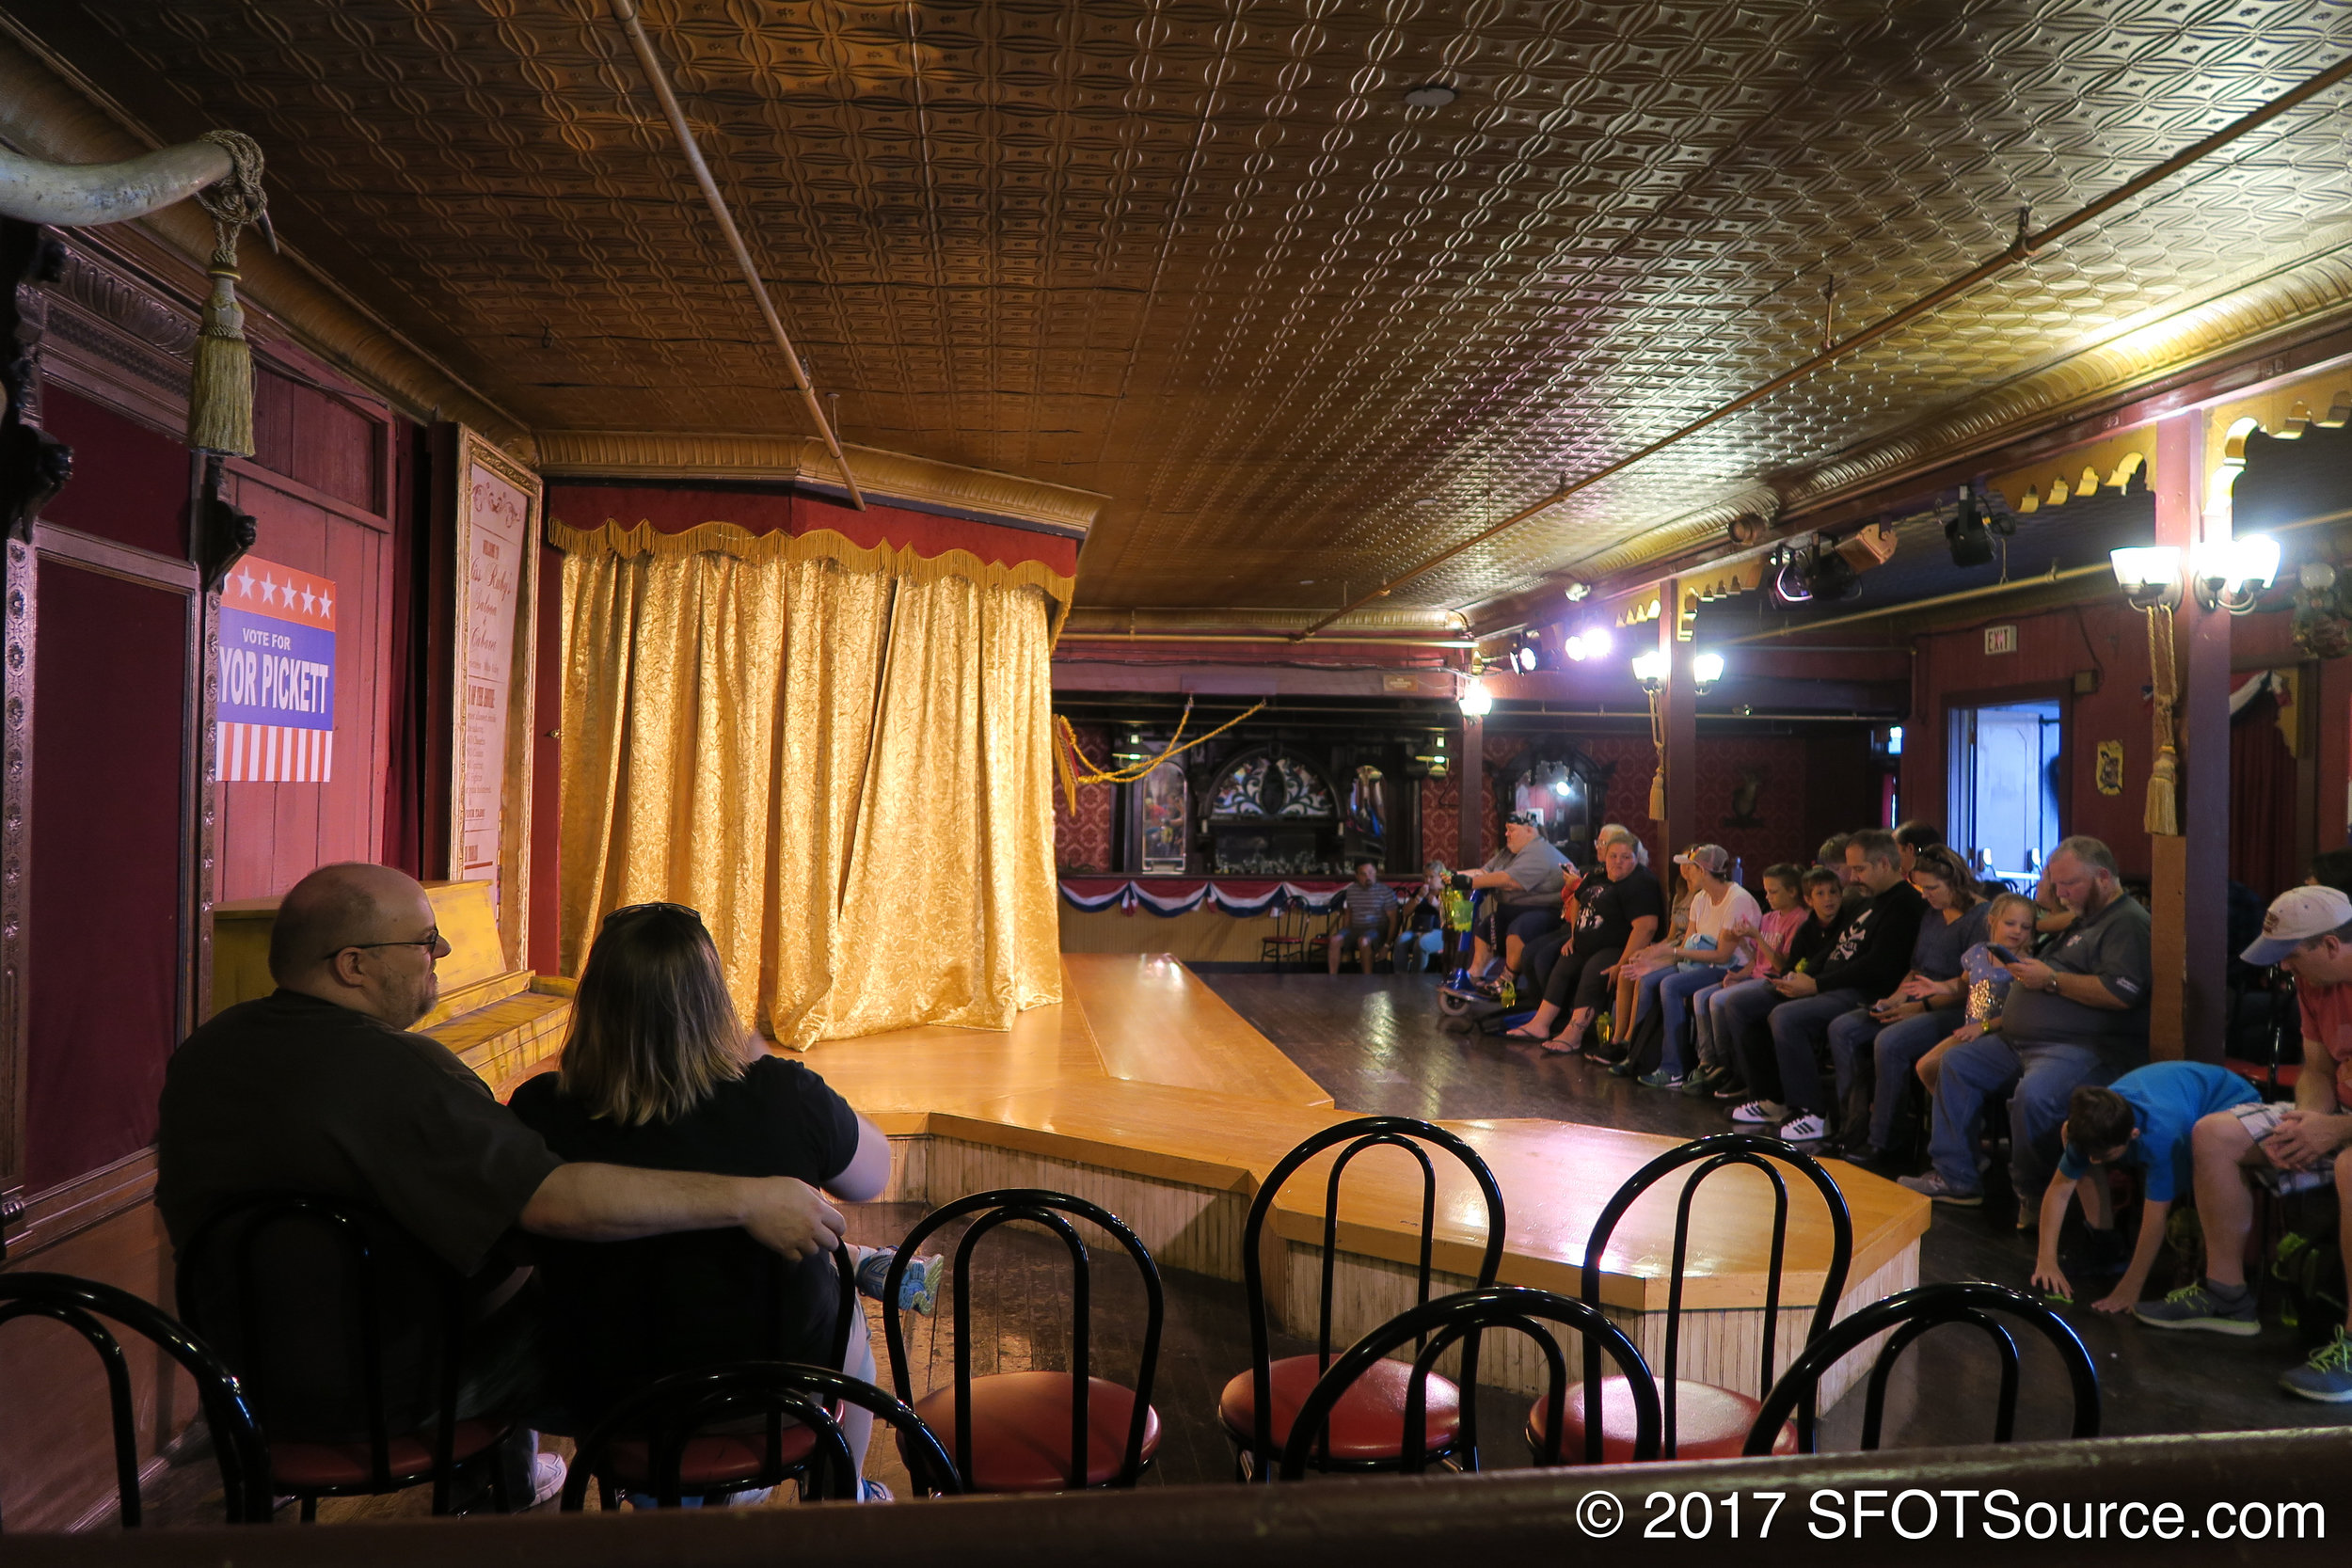 An interior look at Crazy Horse Saloon.